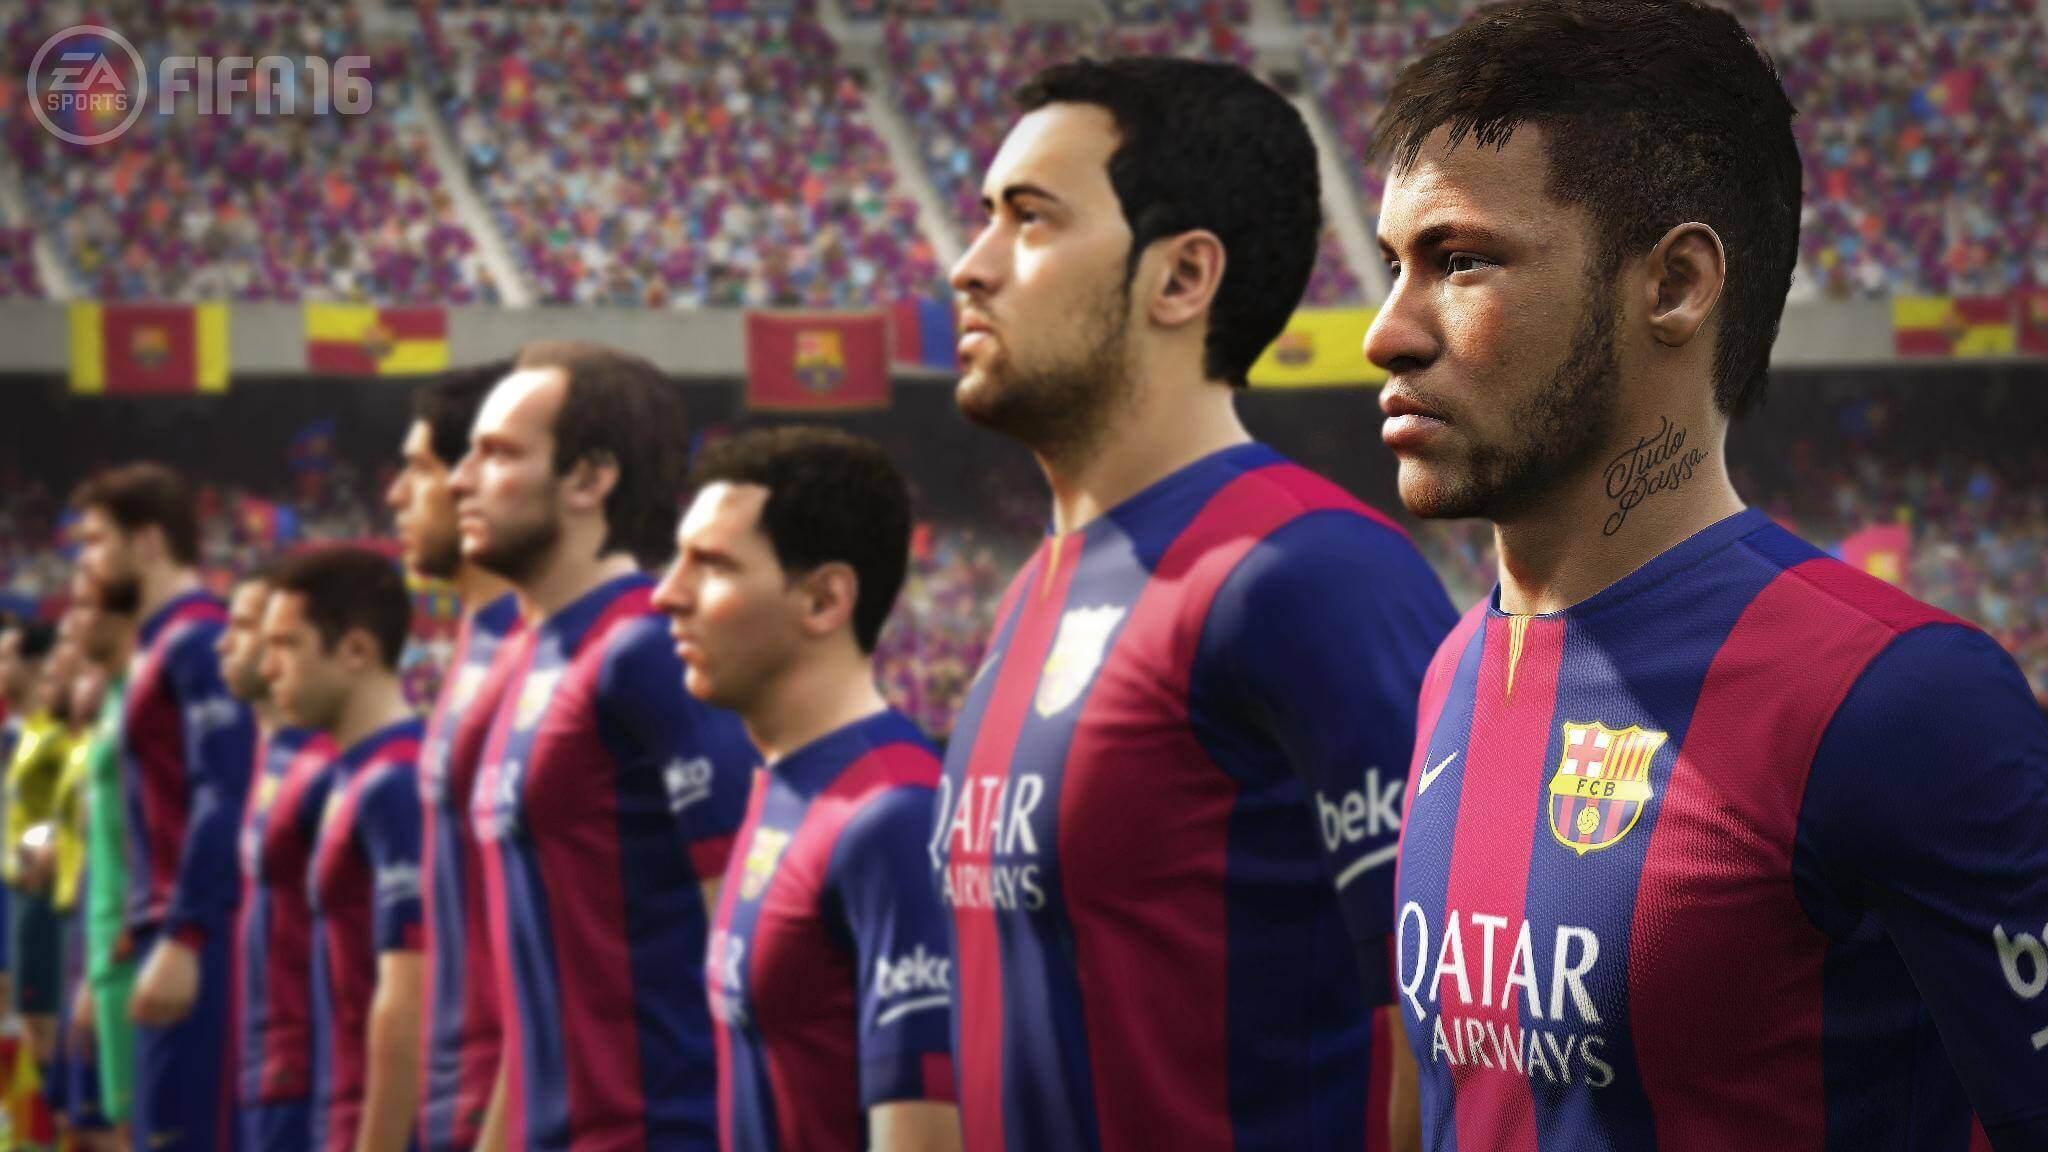 Fifa 16 Team Barcelona